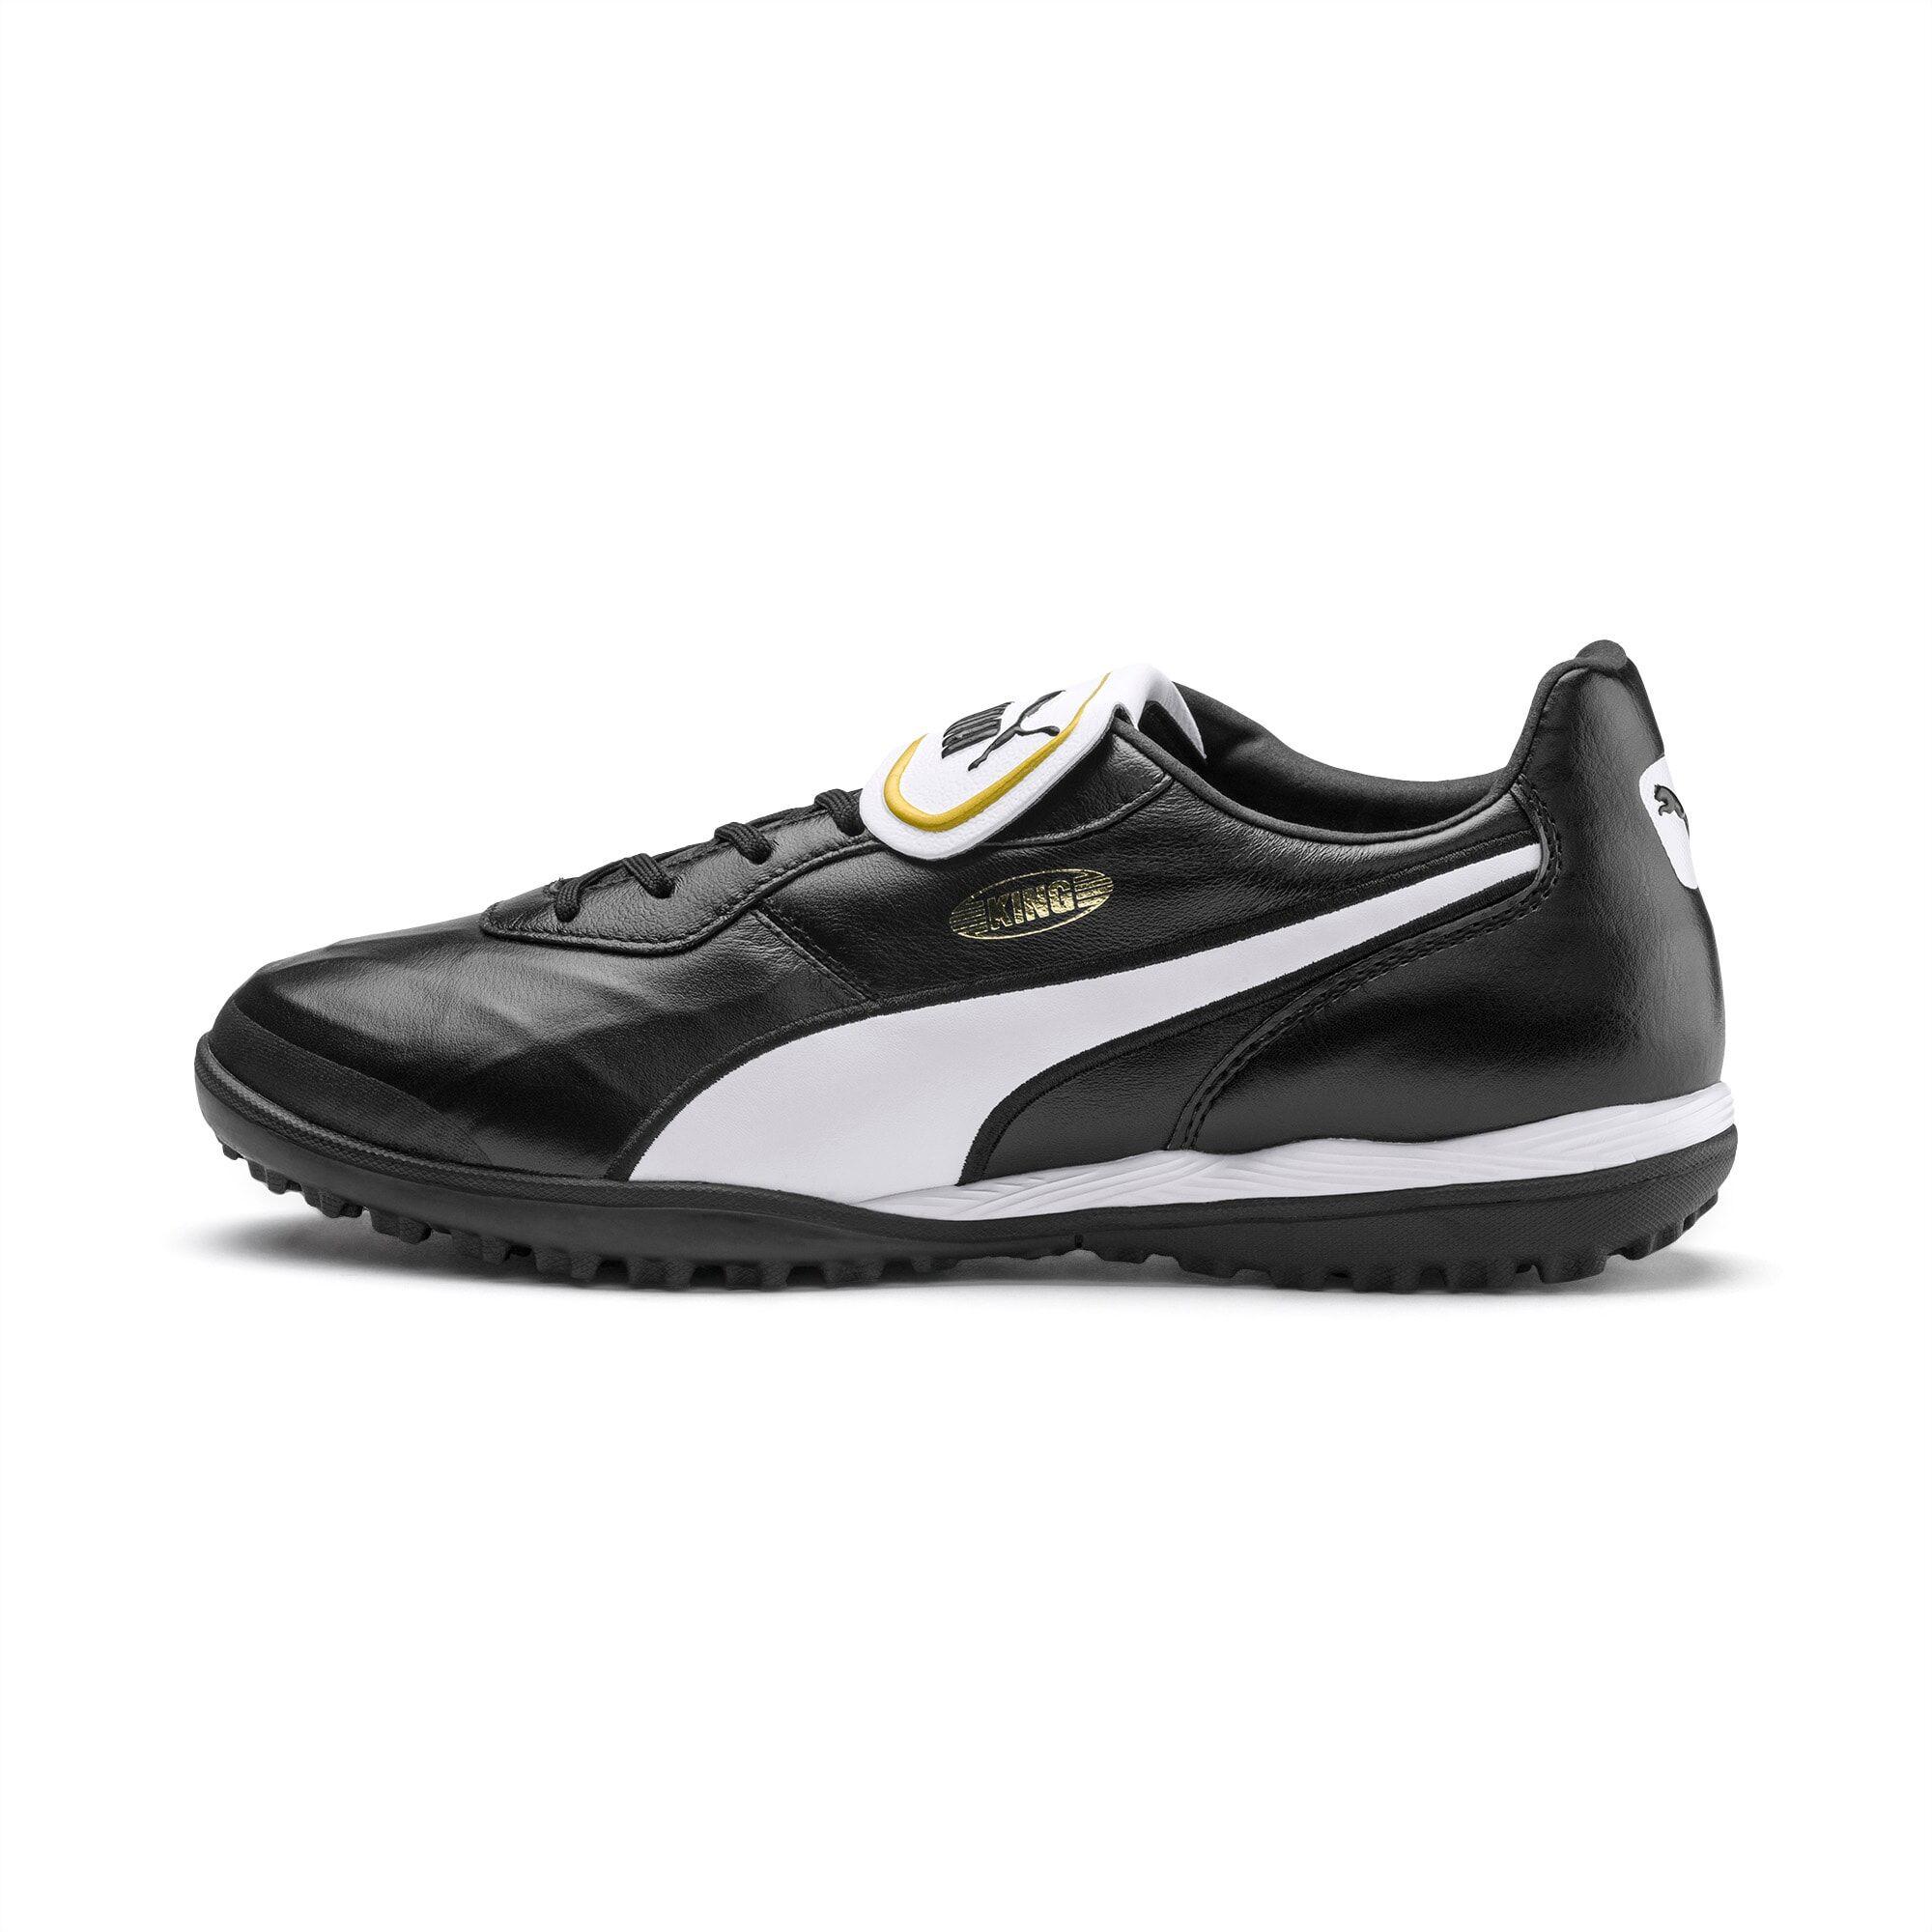 PUMA Chaussure de foot KING TOP TT, Noir/Blanc, Taille 39, Vêtements